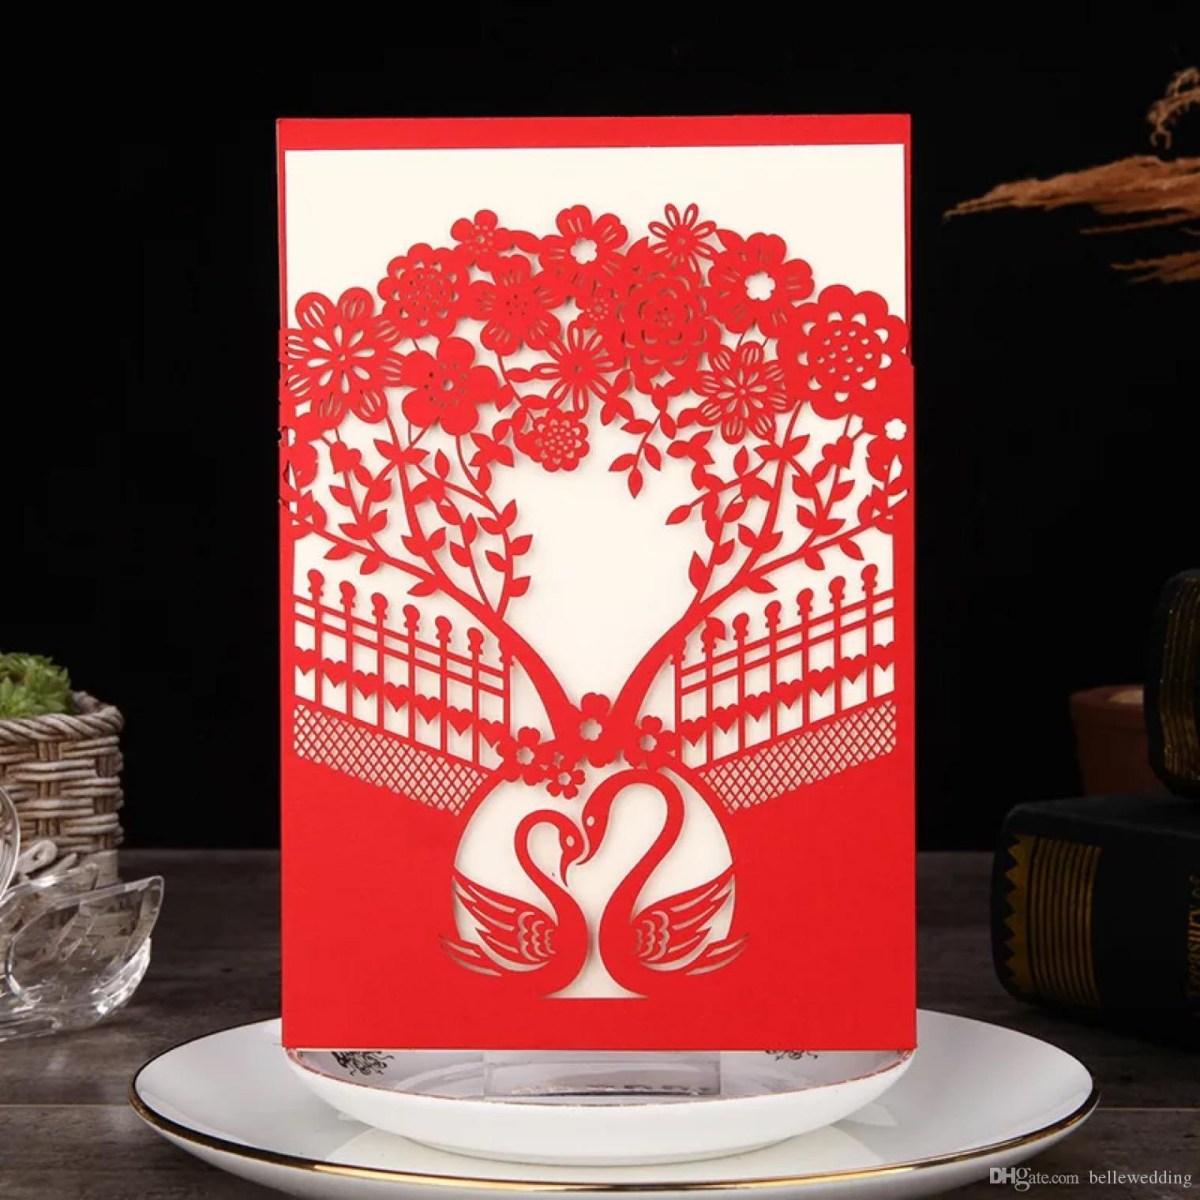 Red Wedding Invitations Laser Cut Wedding Invitations Pocket Red Invitation Card With Trees Swans Flowers Wedding Invitations With Envelopes Bw I0054